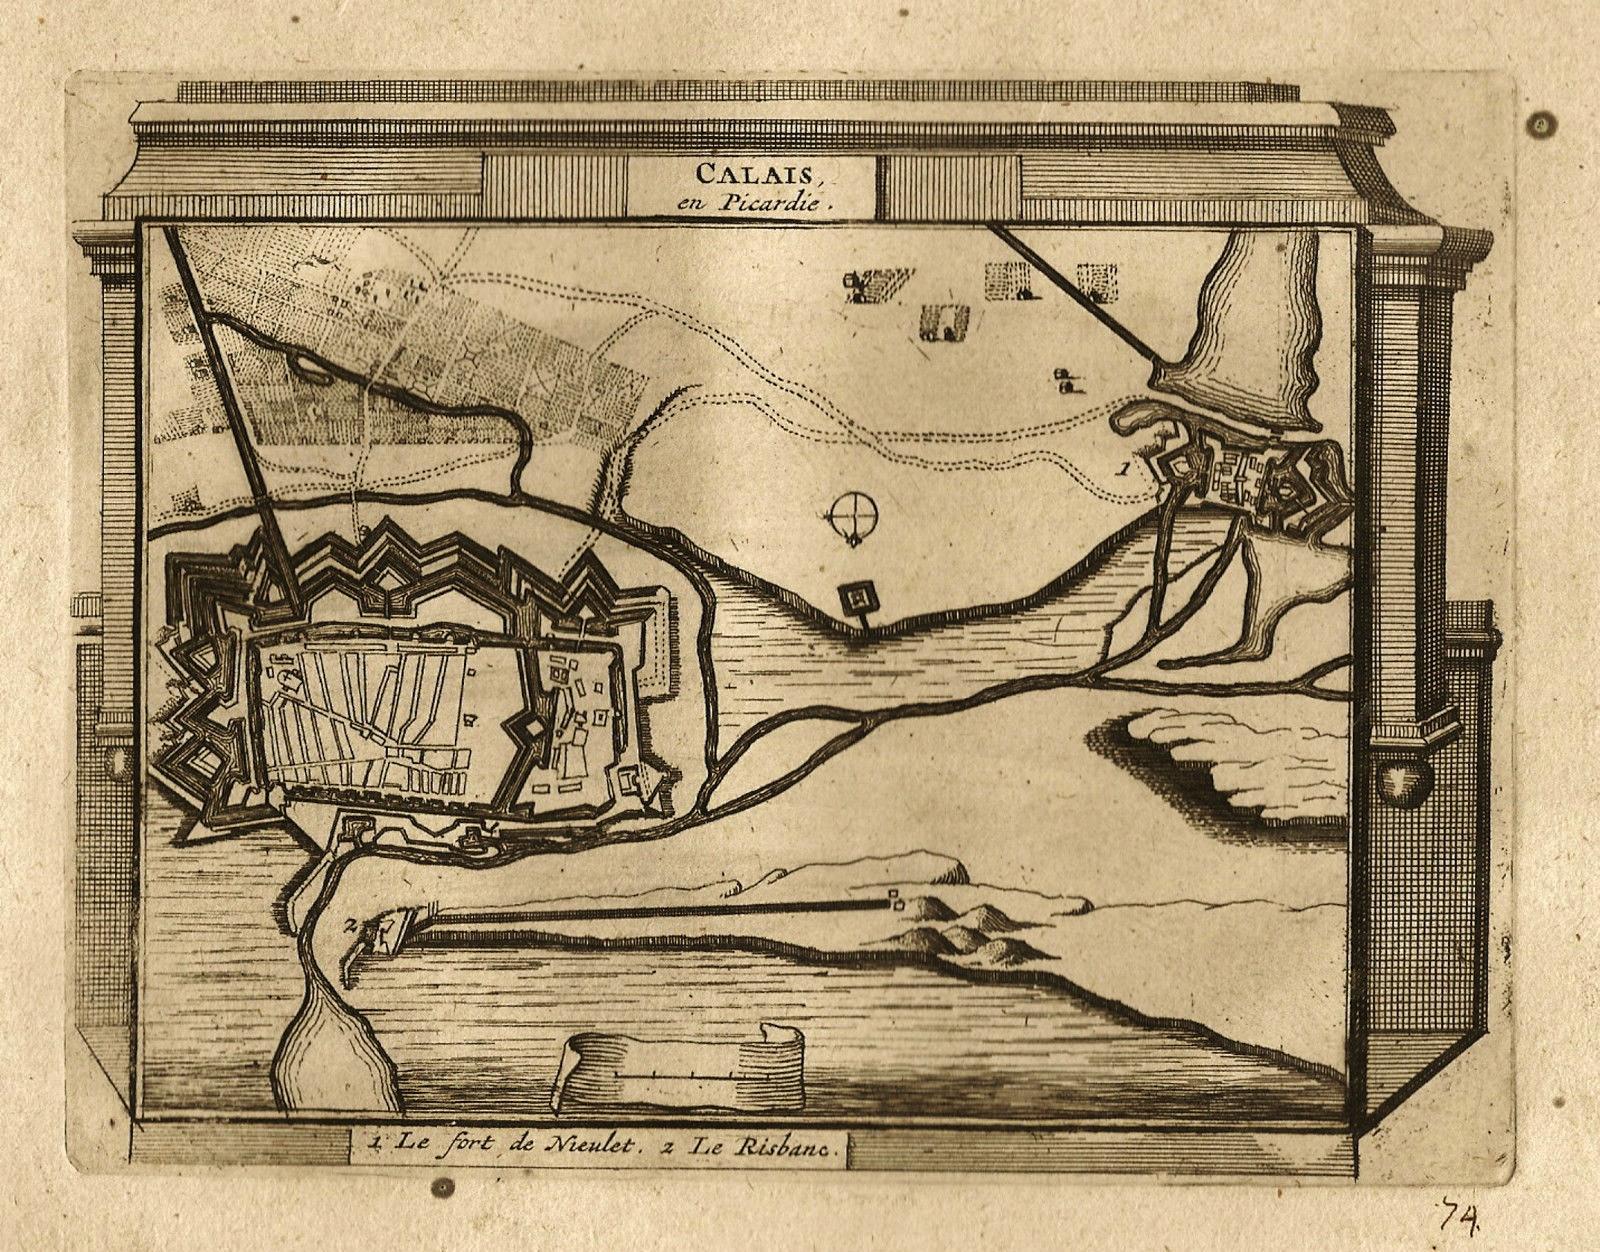 Calais picardie carte du fort nieulay